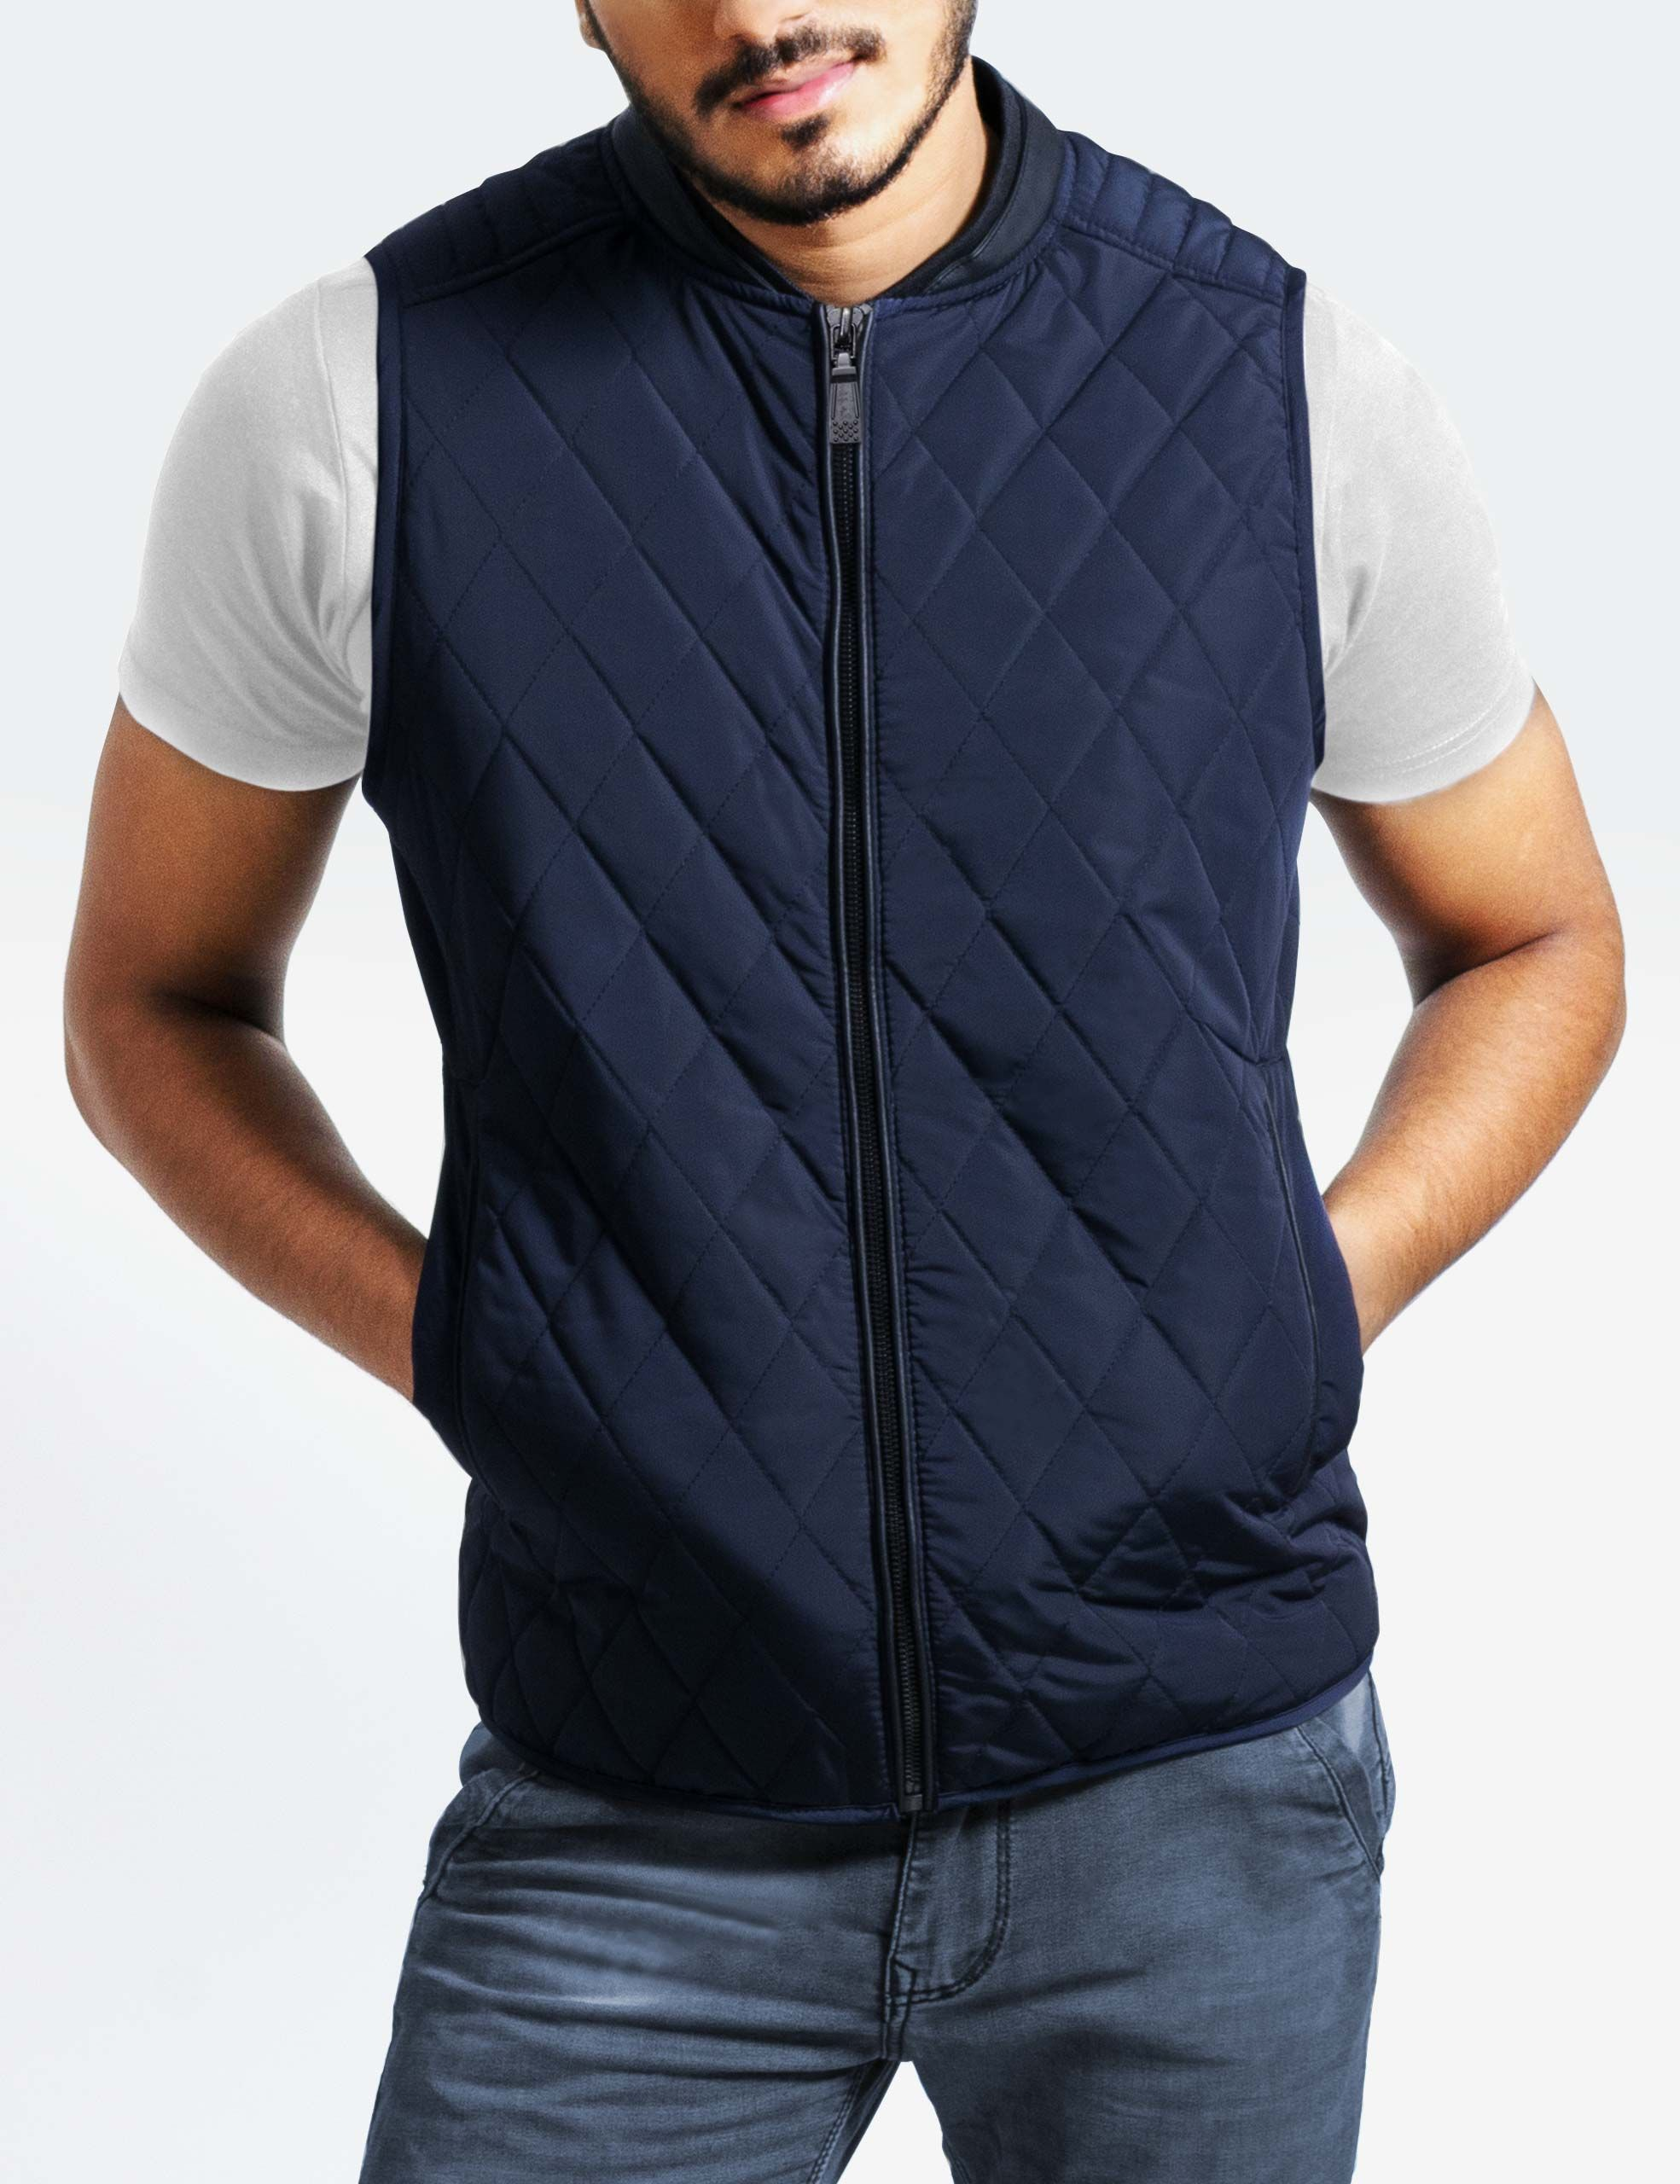 Mensquiltedvest Menus Jackets Pinterest Quilted vest